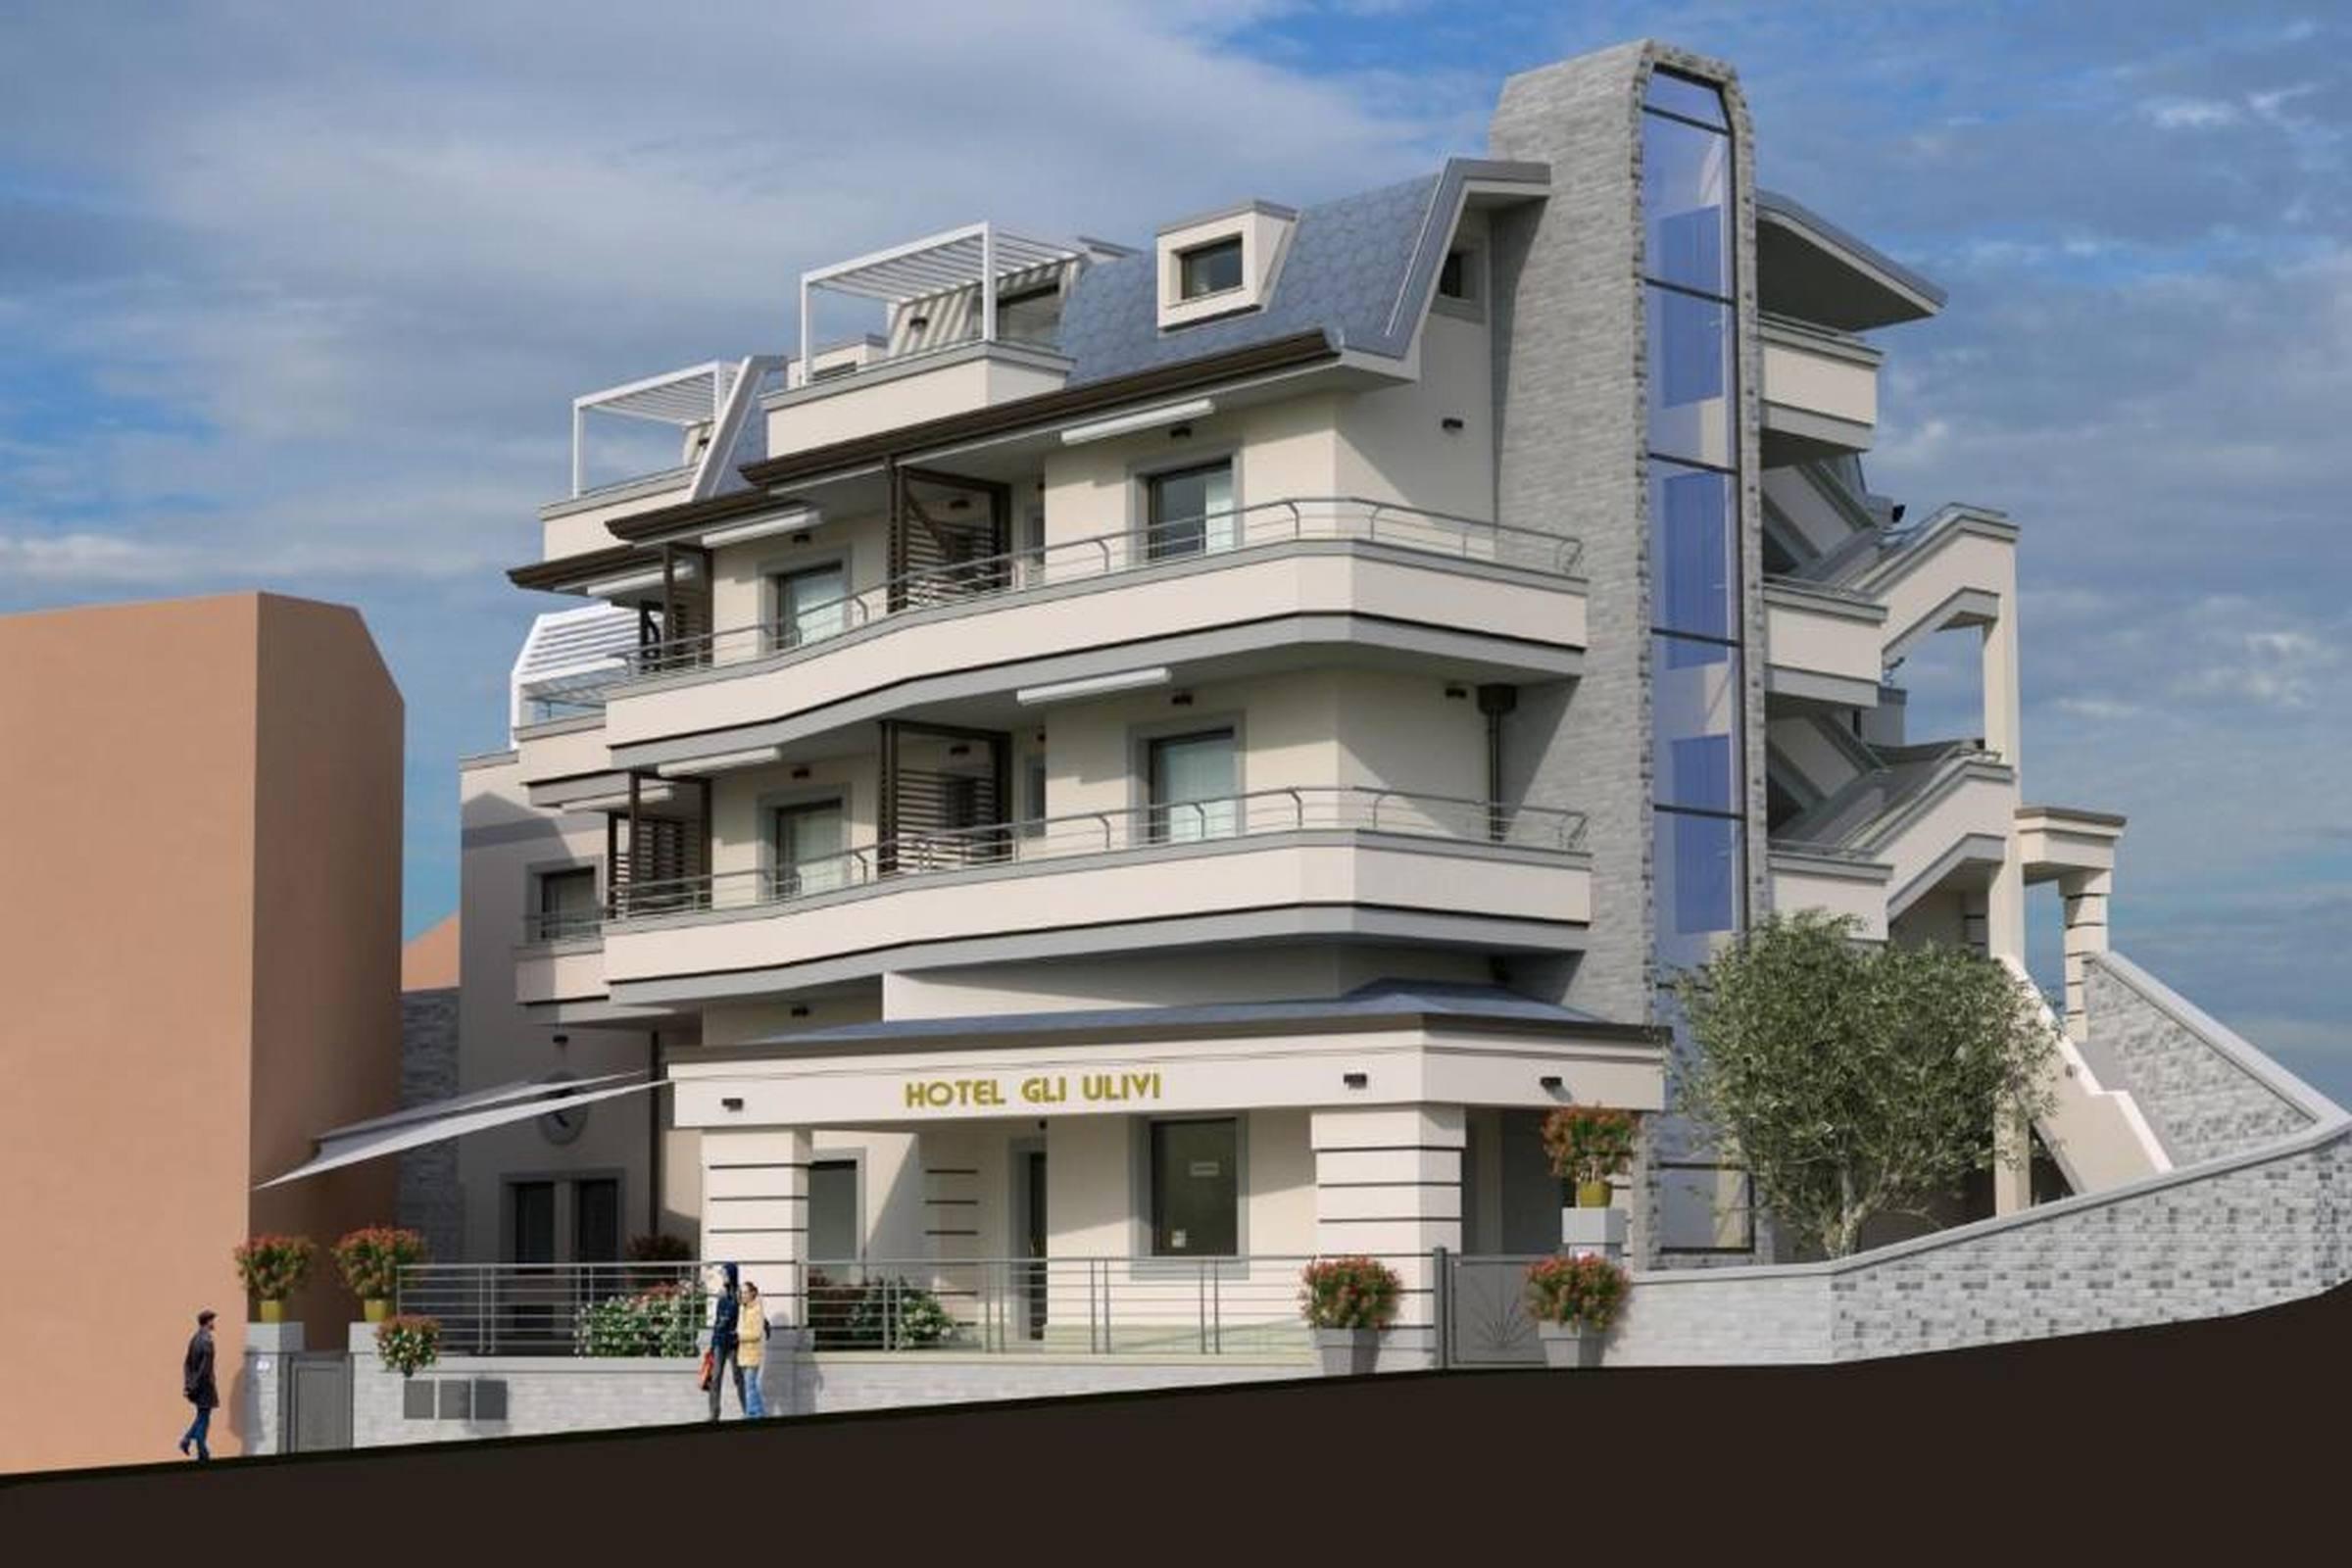 Hotel Gli UliviC, Afar Zone 3